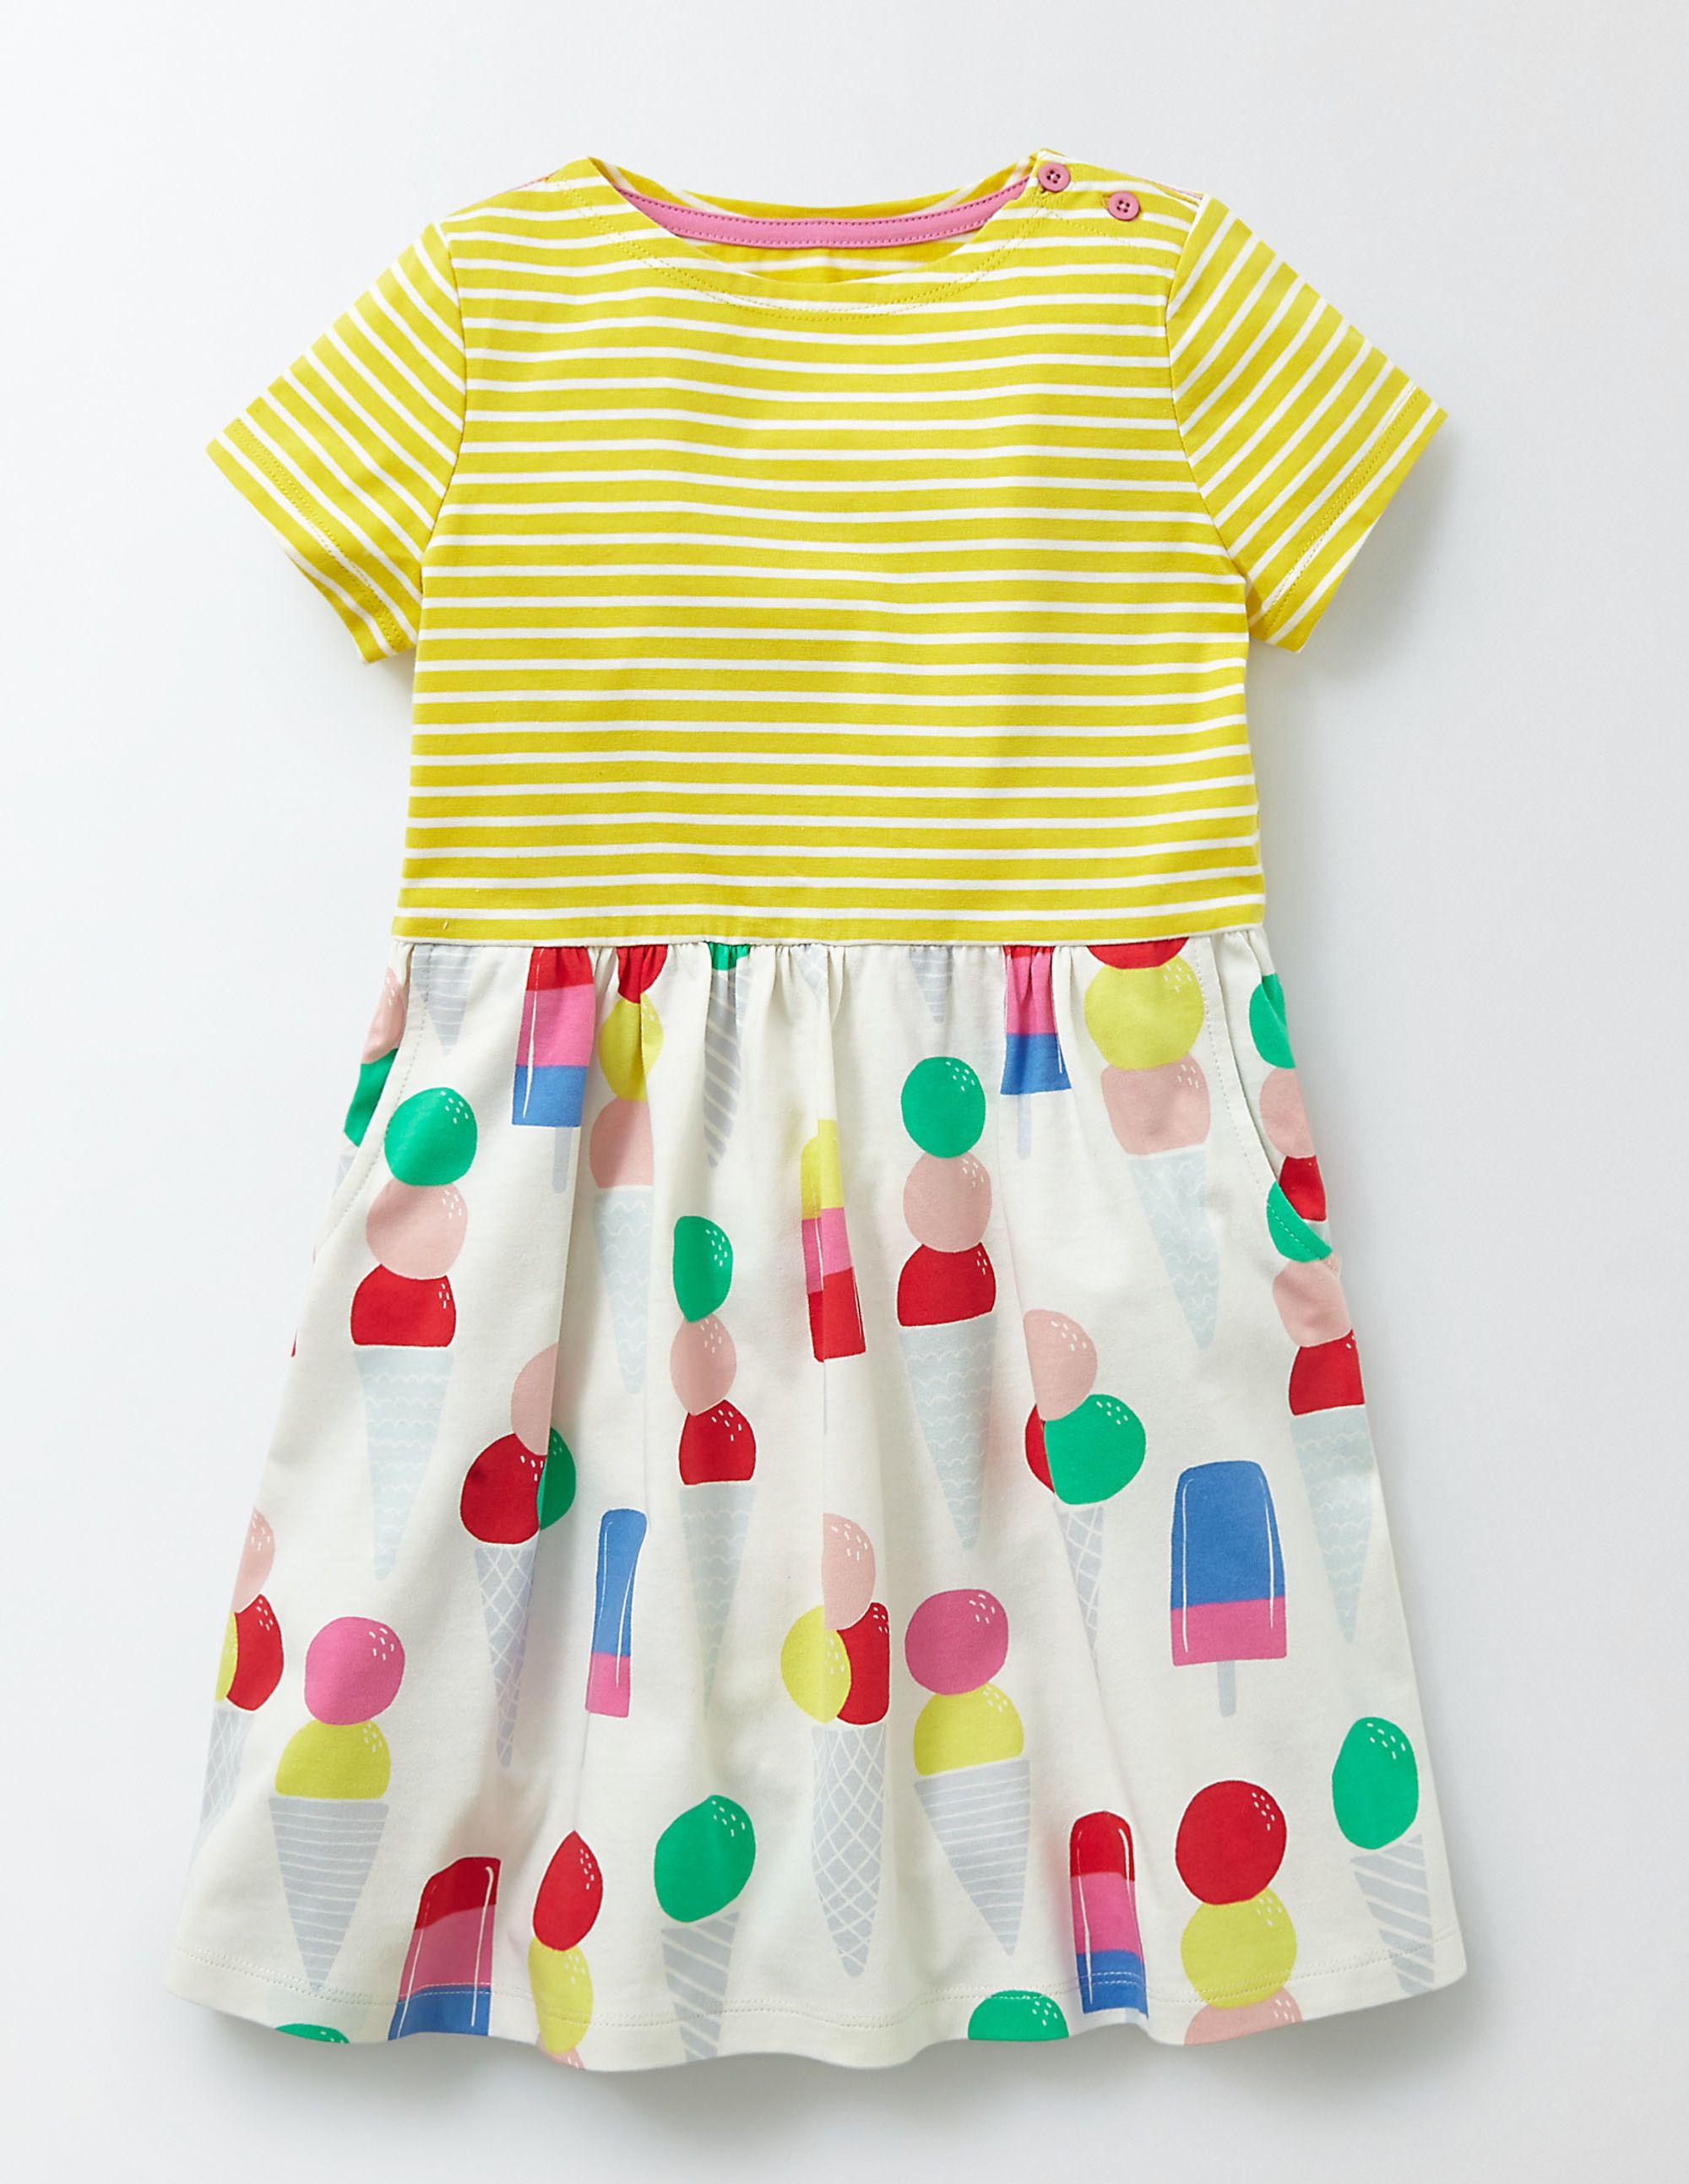 57b8f8cd91e5 Kids Summer Dresses, Girls Casual Dresses, Baby Girl Dresses, Girls Holiday  Dresses,